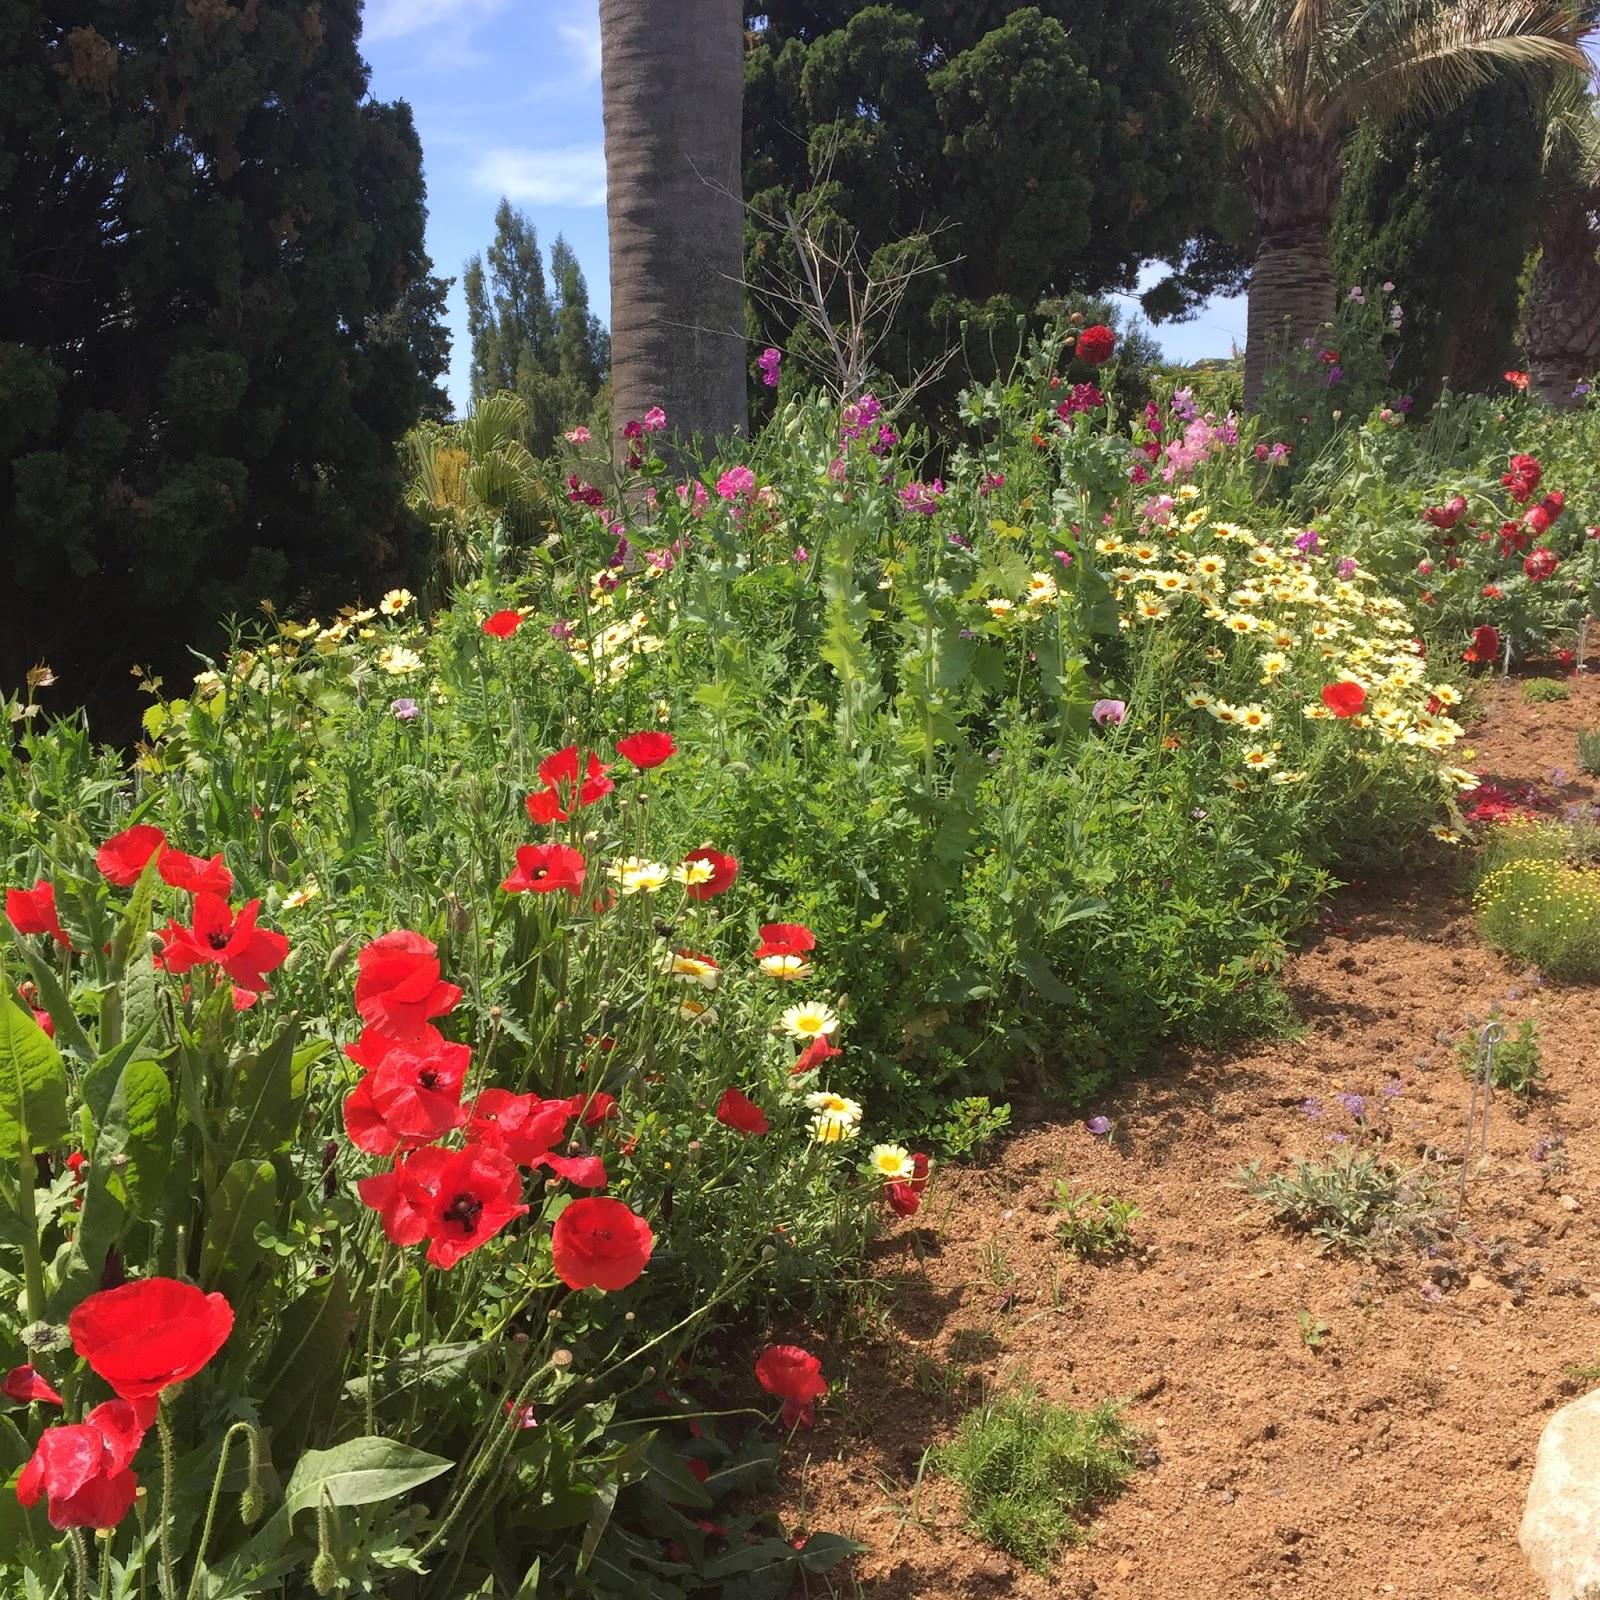 Gem 39 s country life visiting jardin botanico marimurta for Jardin botanico nocturno 2016